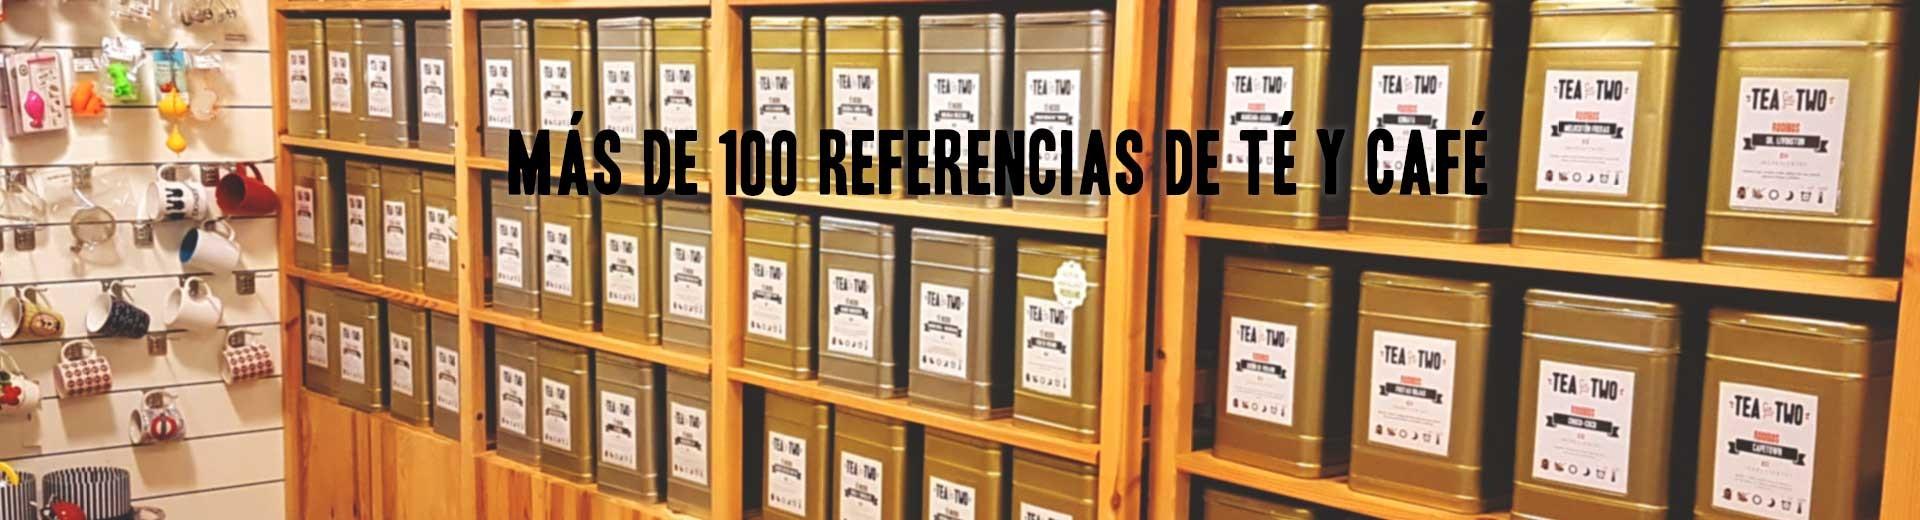 Amplio catálogo de tés e infusiones